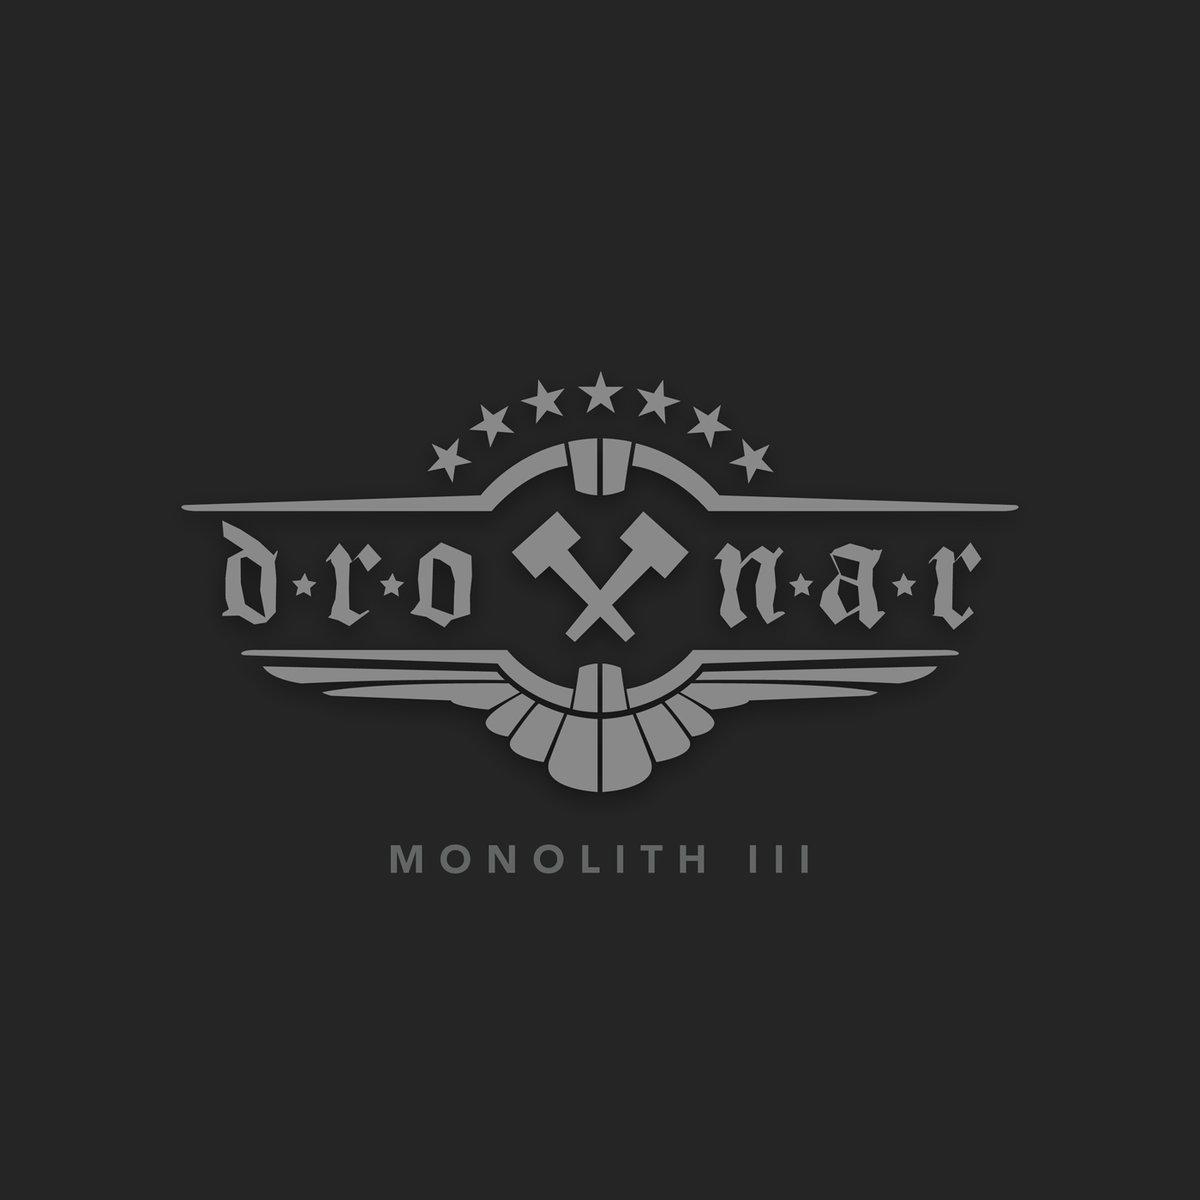 Drottnar - Monolith III